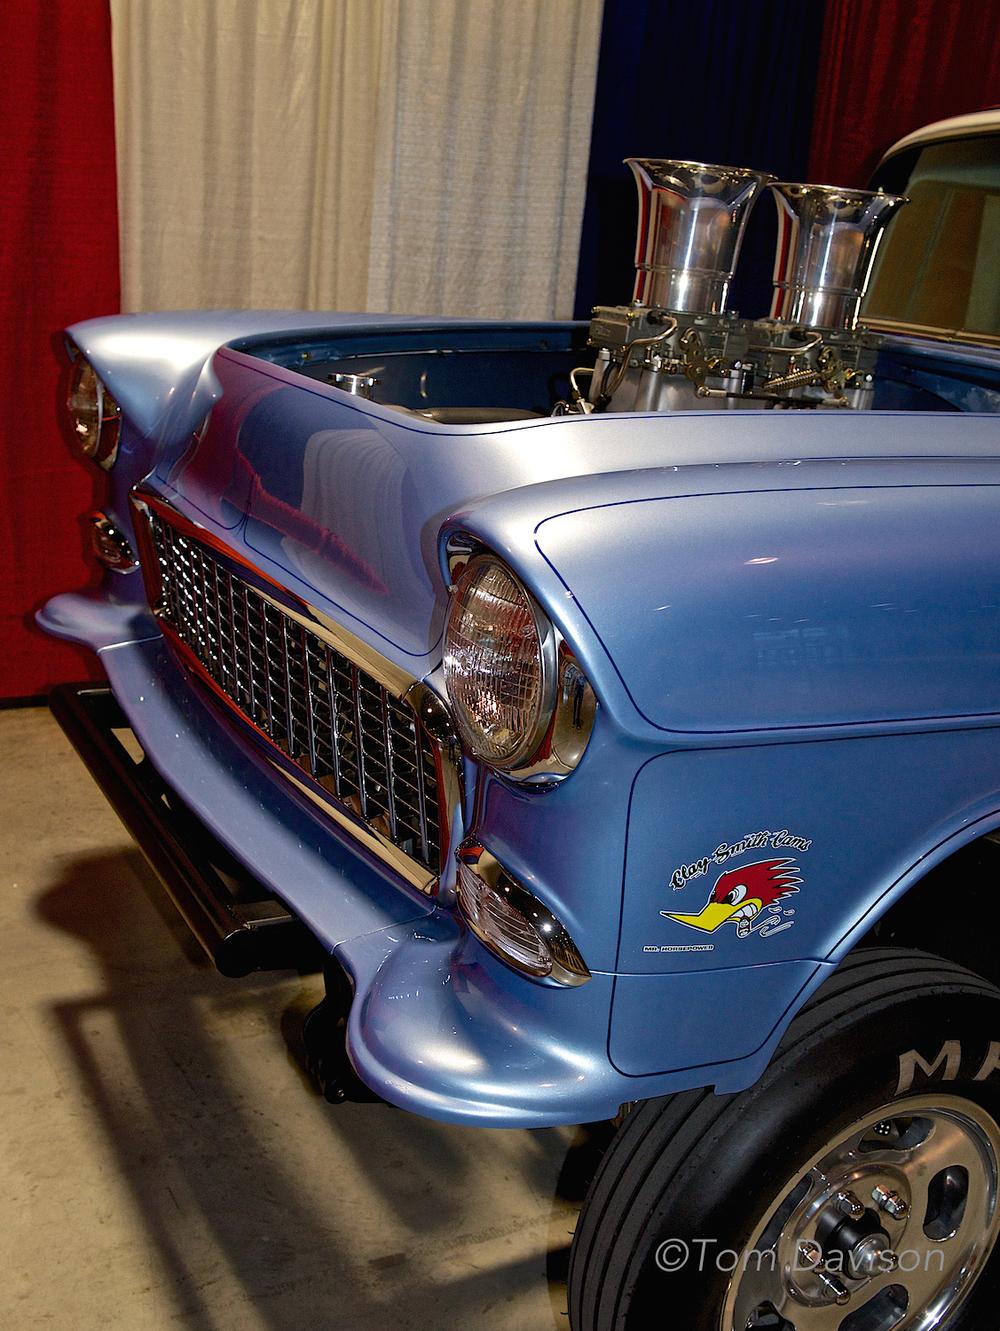 1955 Chevy street racer.